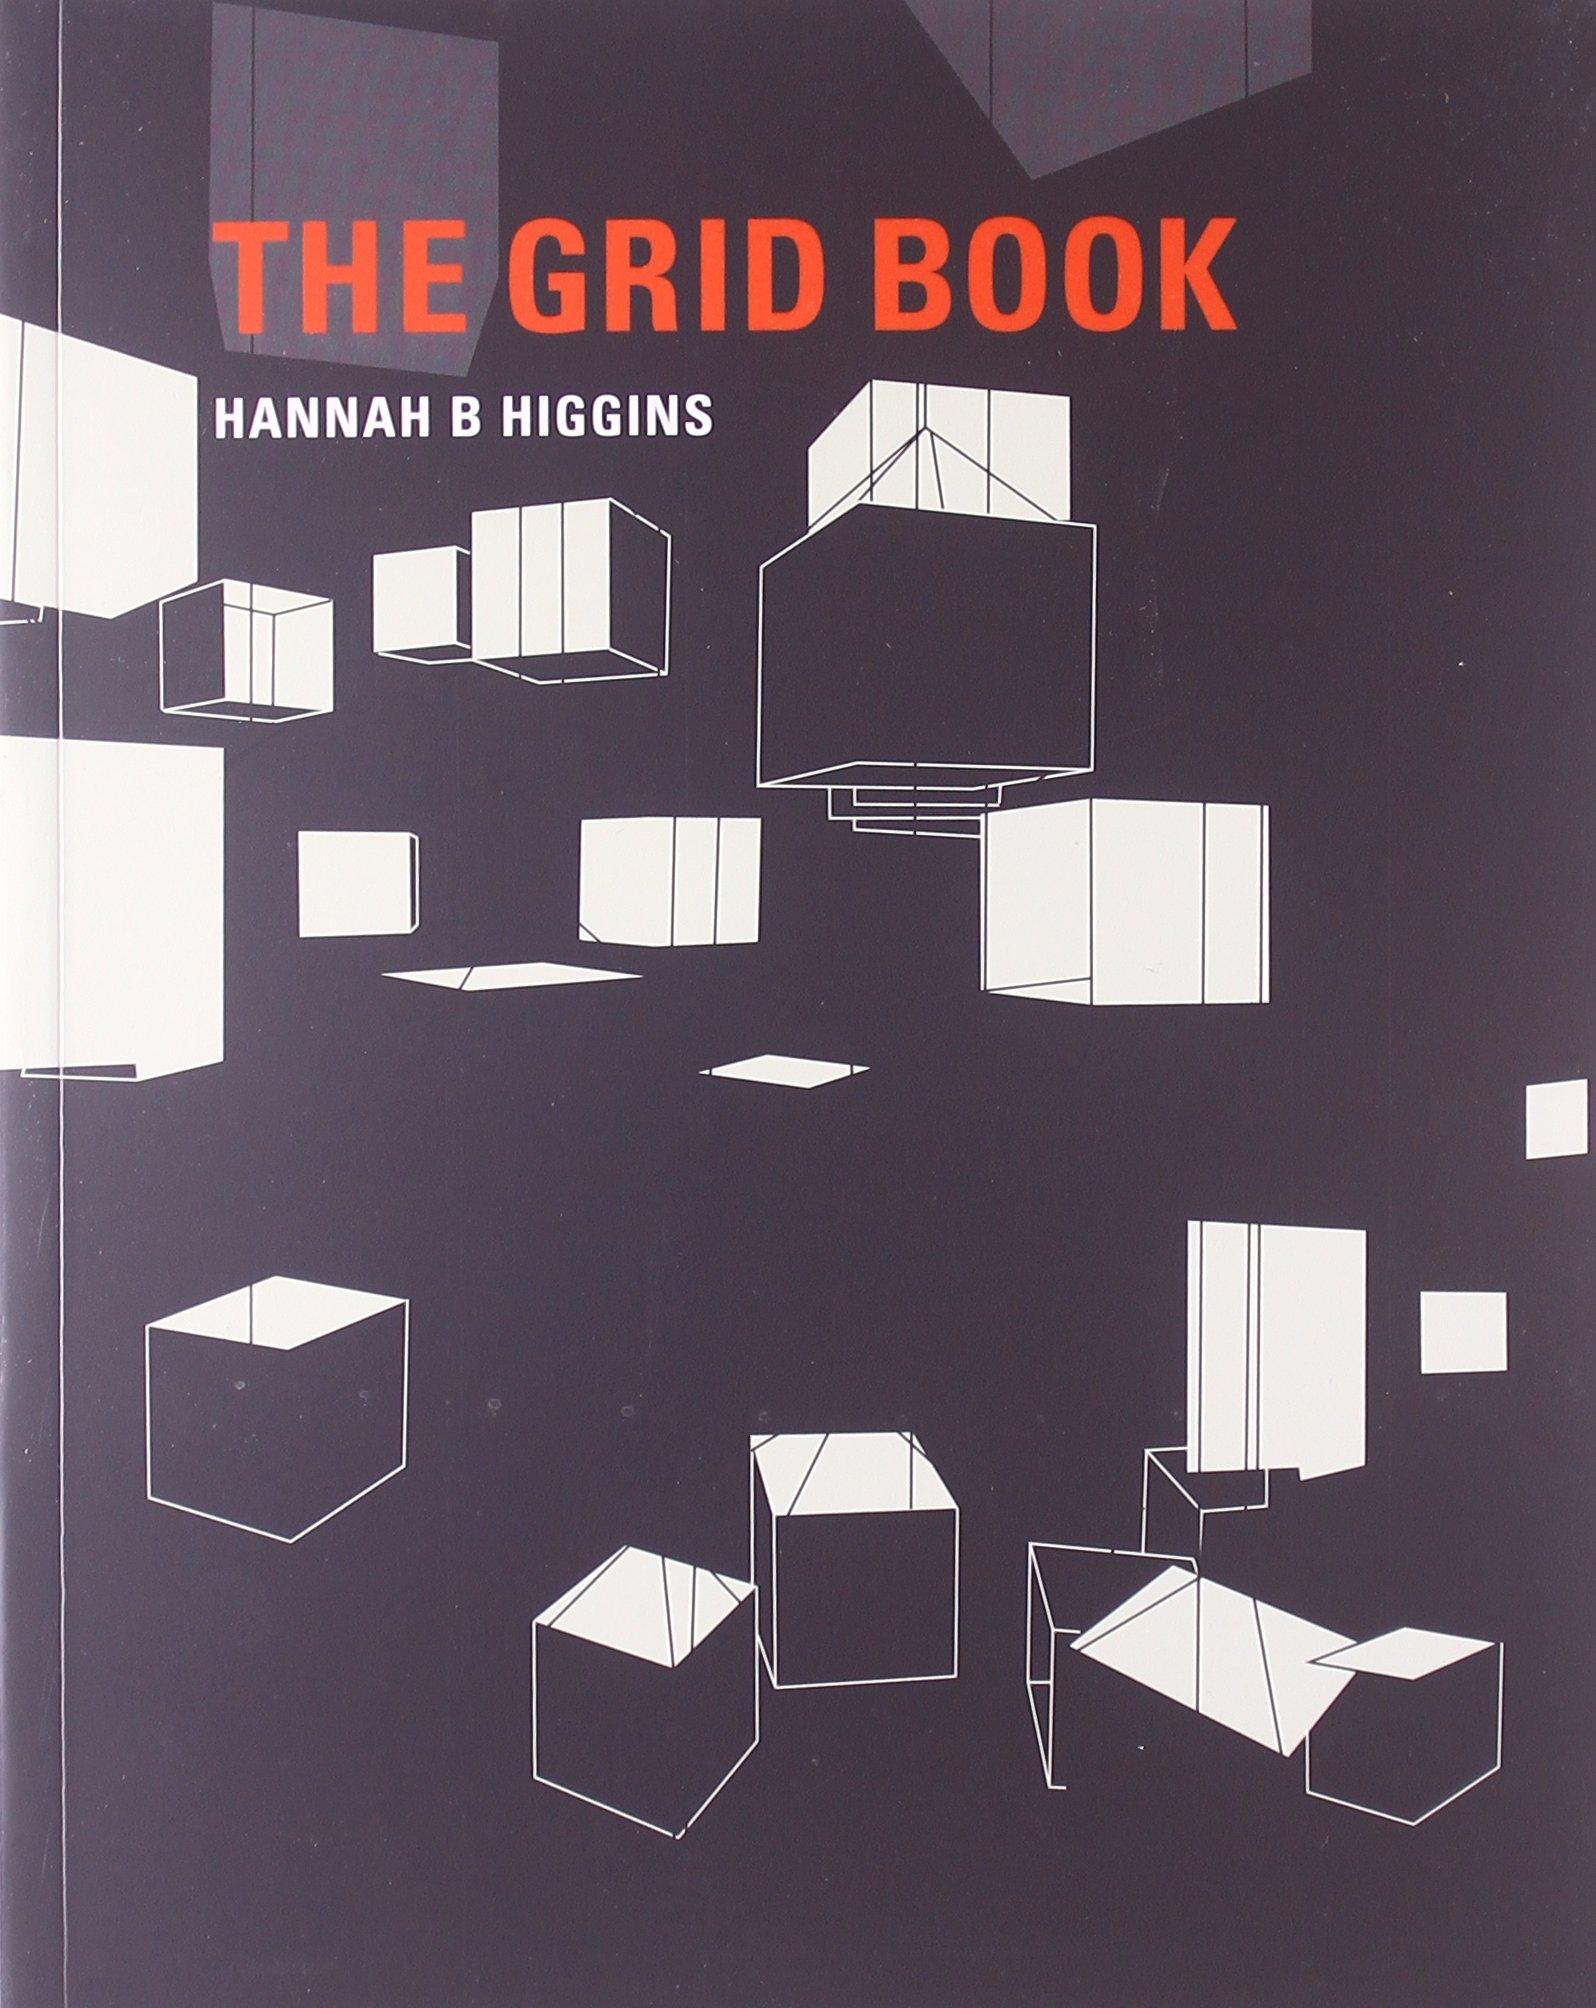 The Grid Book (mit Press): Hannah B Higgins: 9780262512404: Amazon:  Books